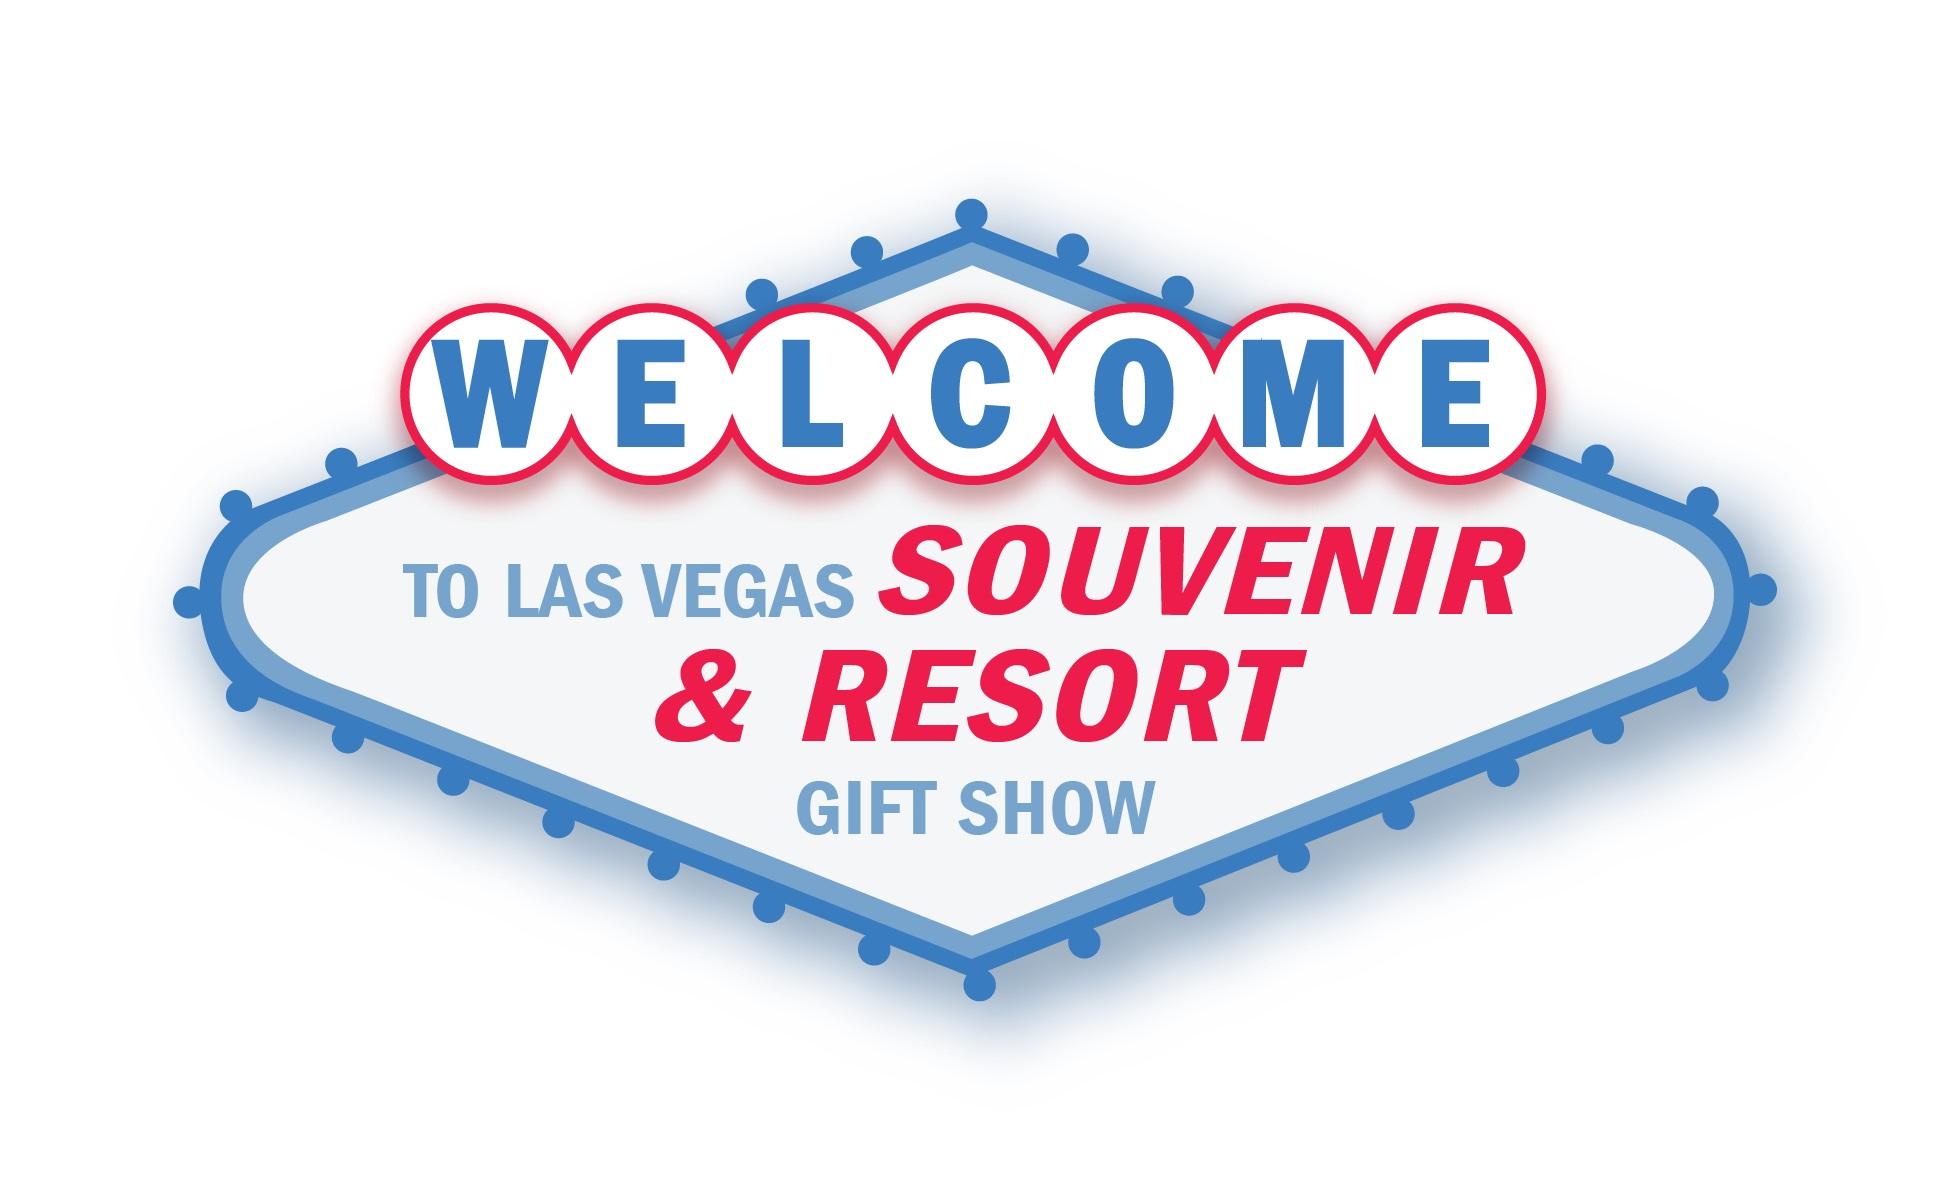 Las Vegas Souvenir & Resort Gift Show